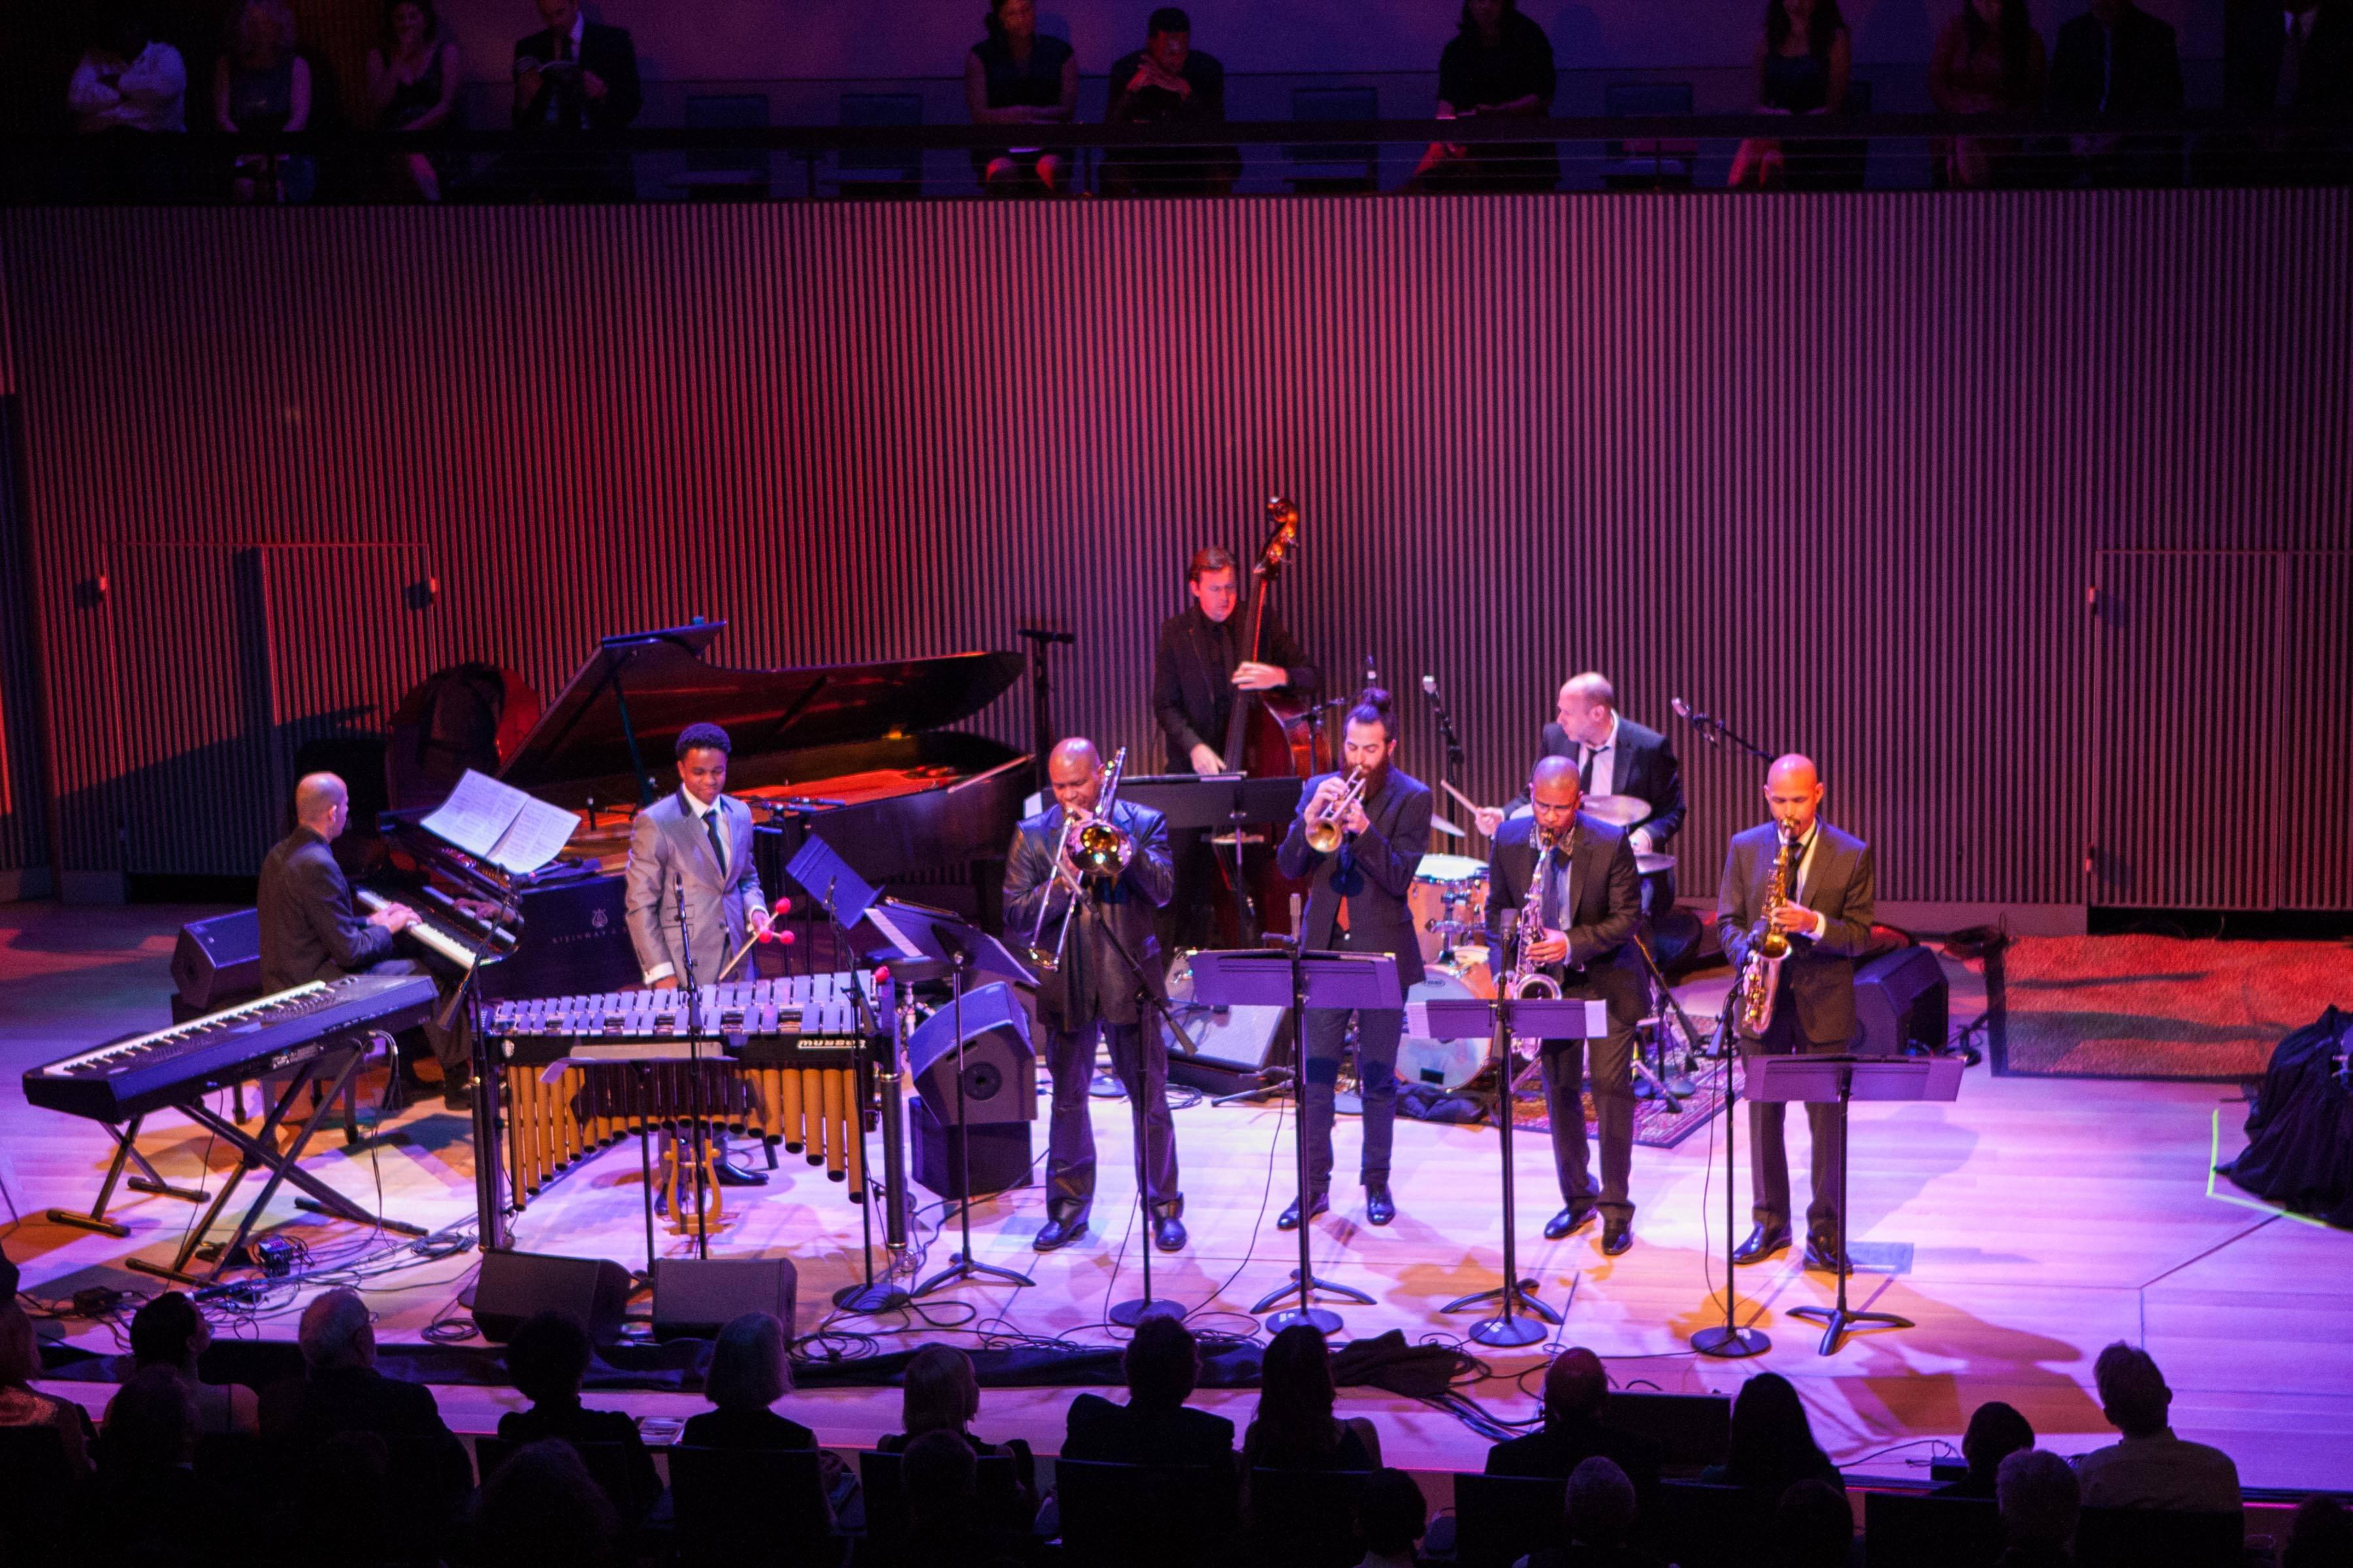 SFJAZZ Historic Opening Night Concert